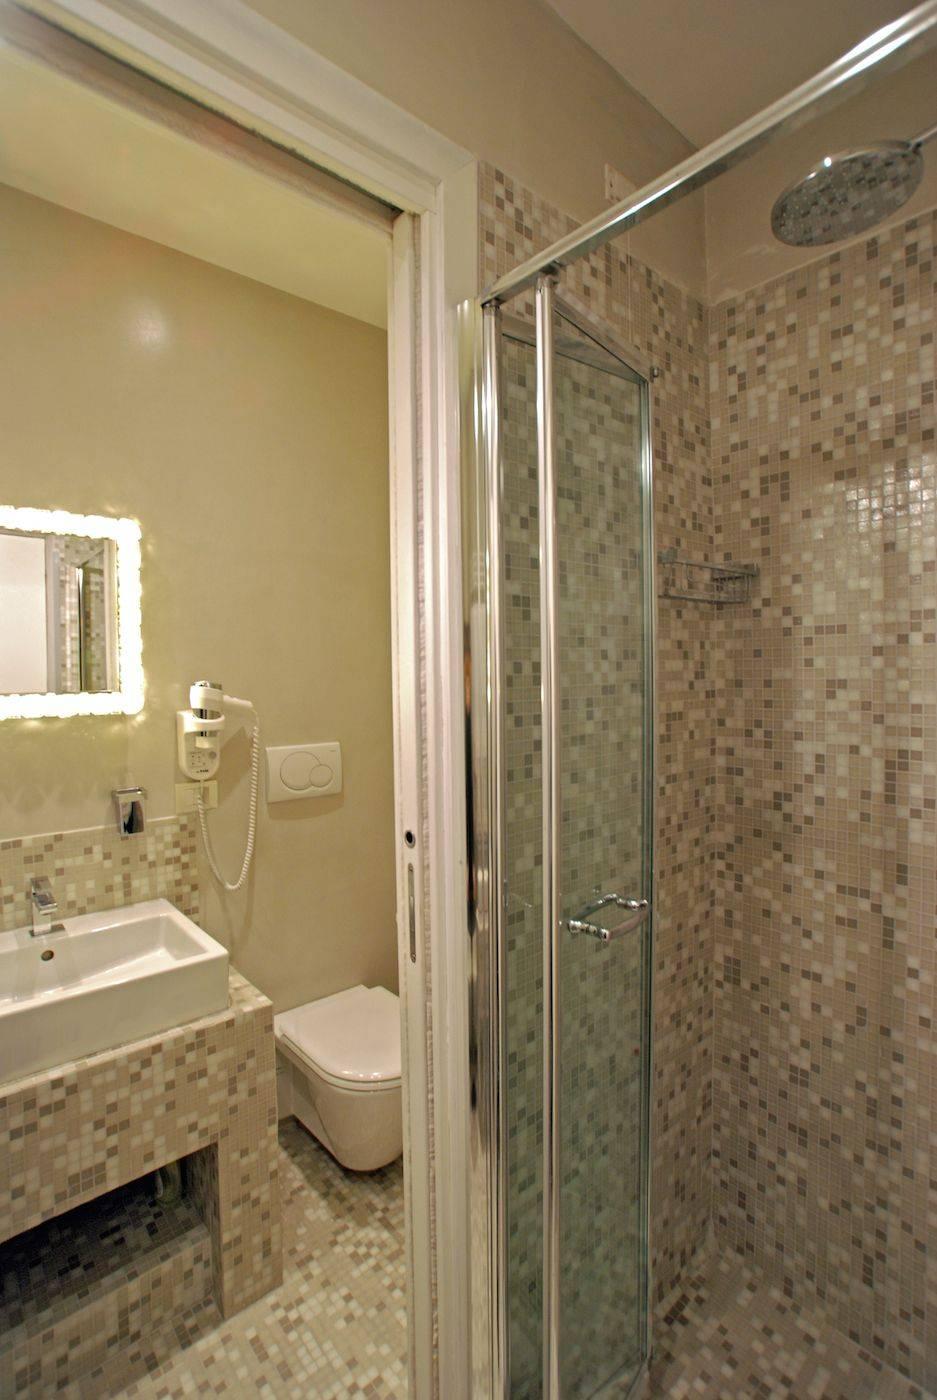 Leonina second bathroom with shower